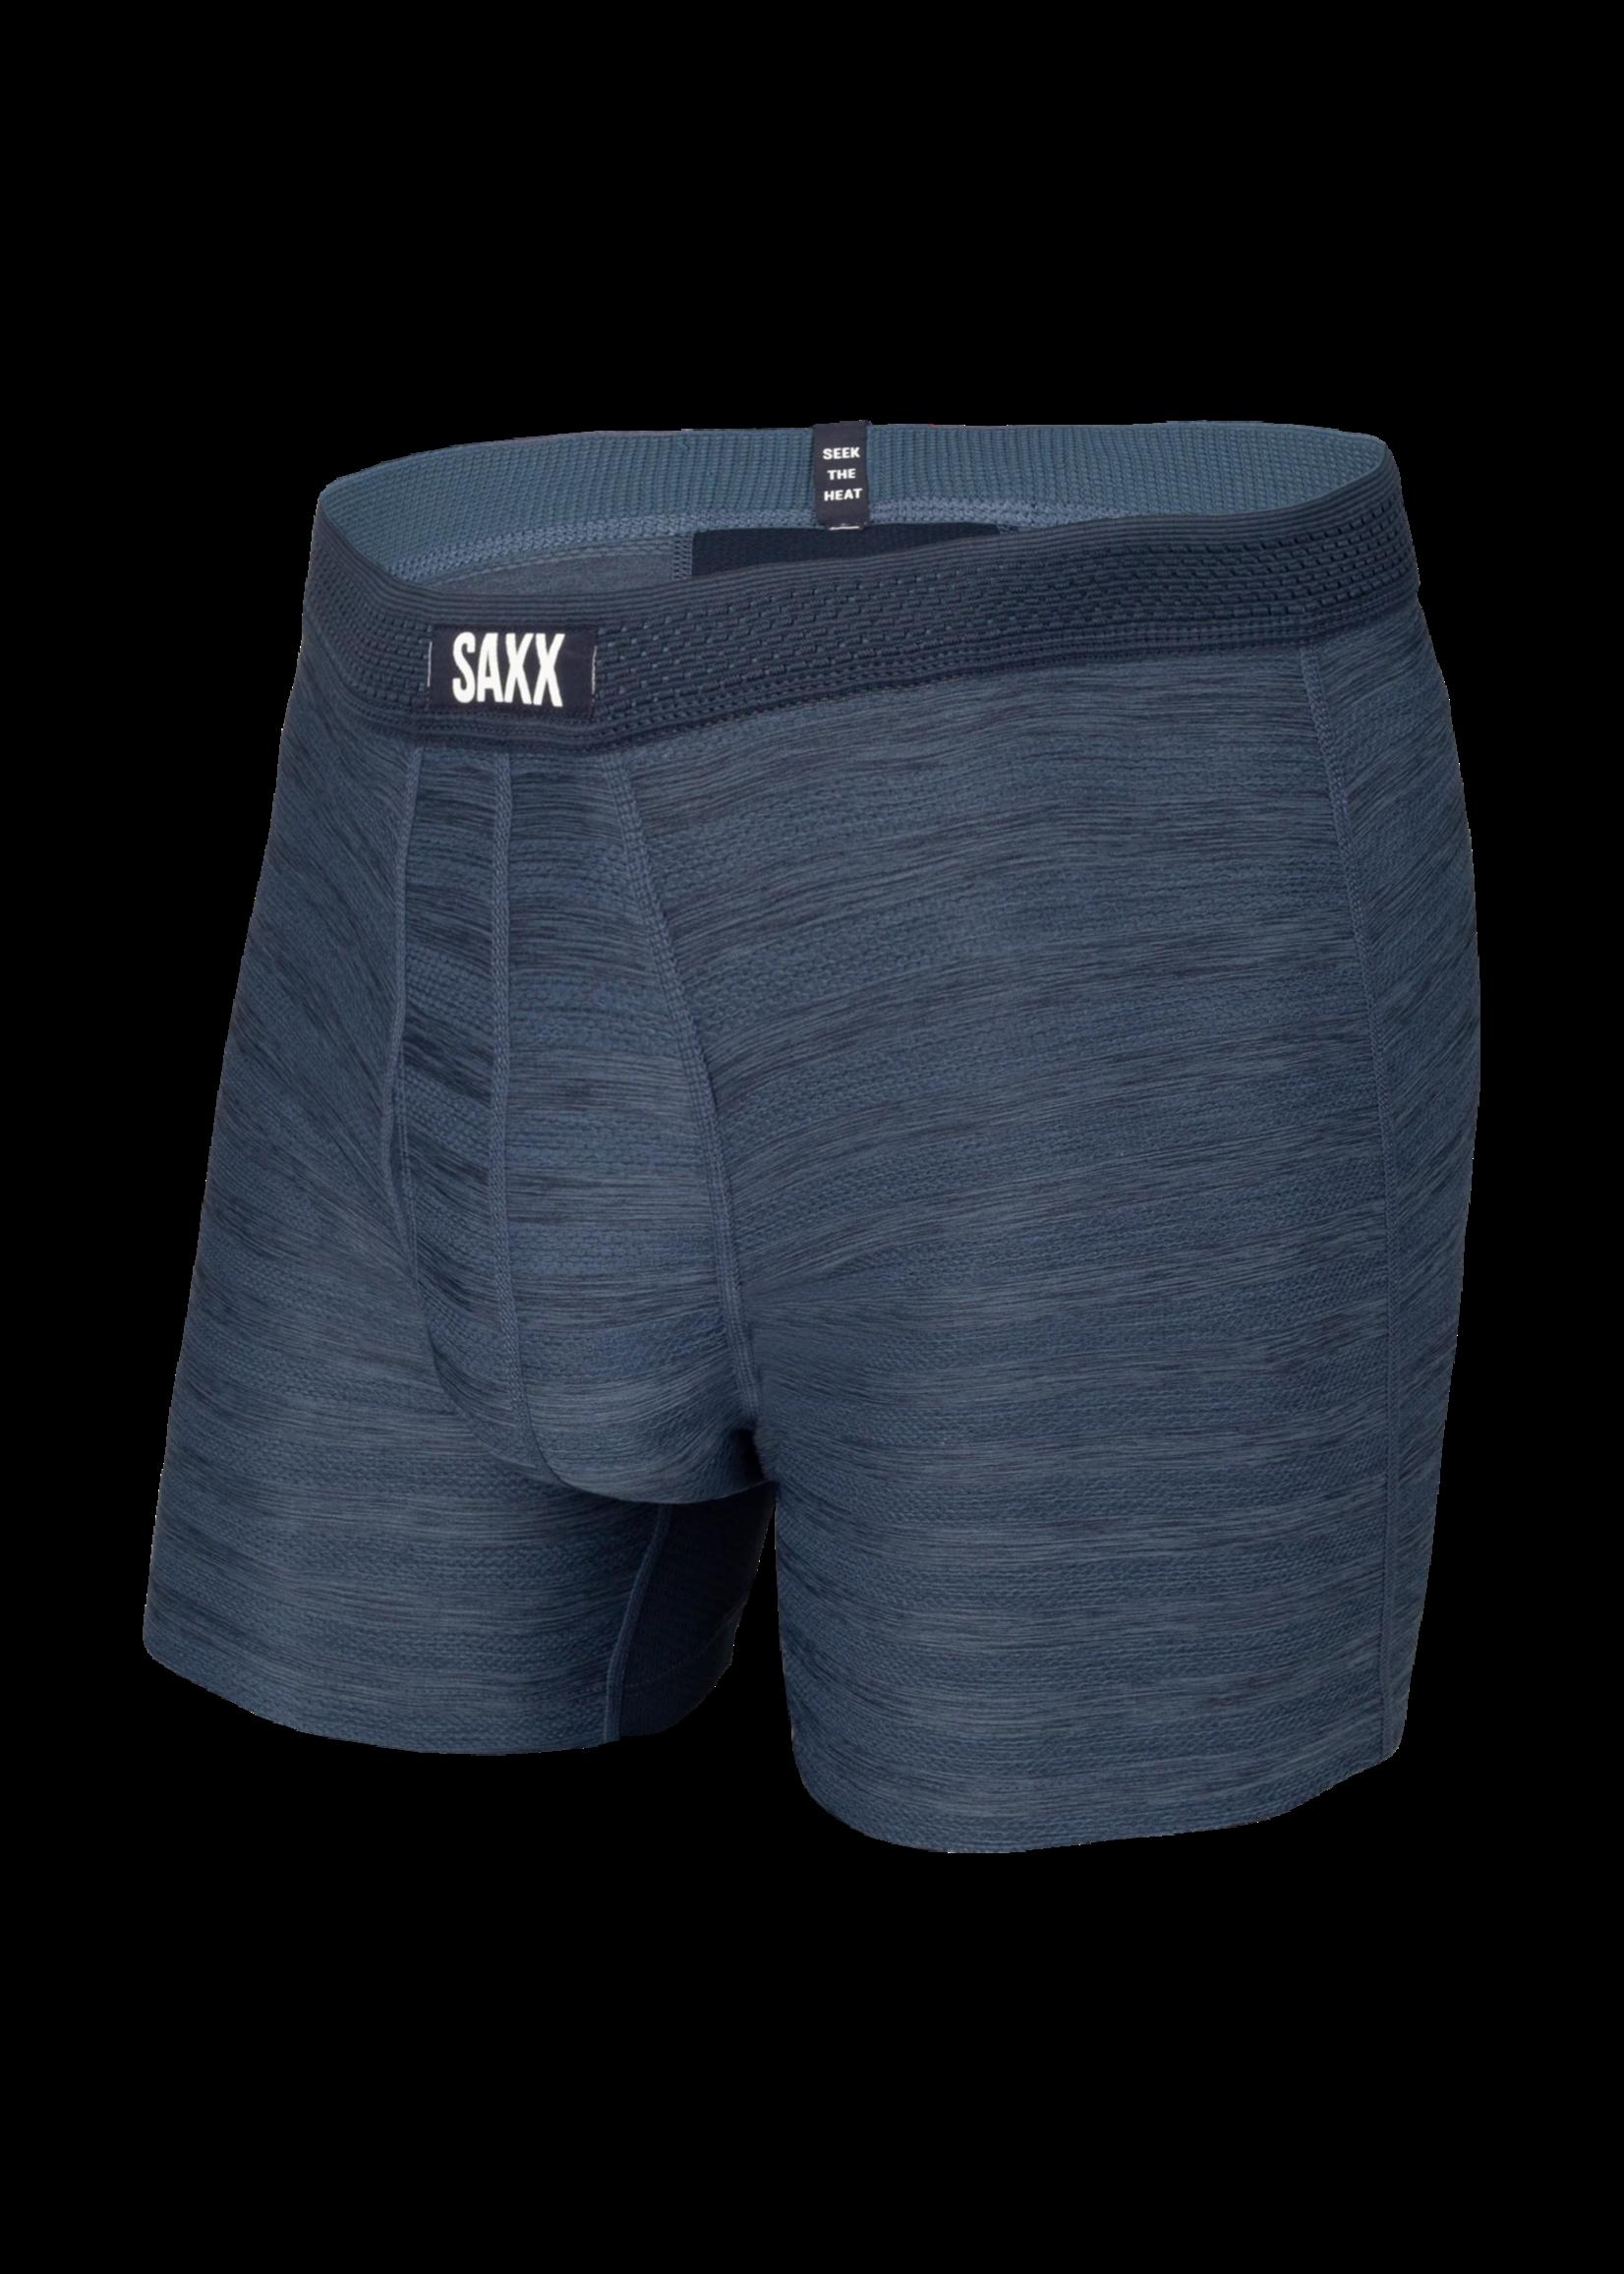 Saxx Hot Shot DDH